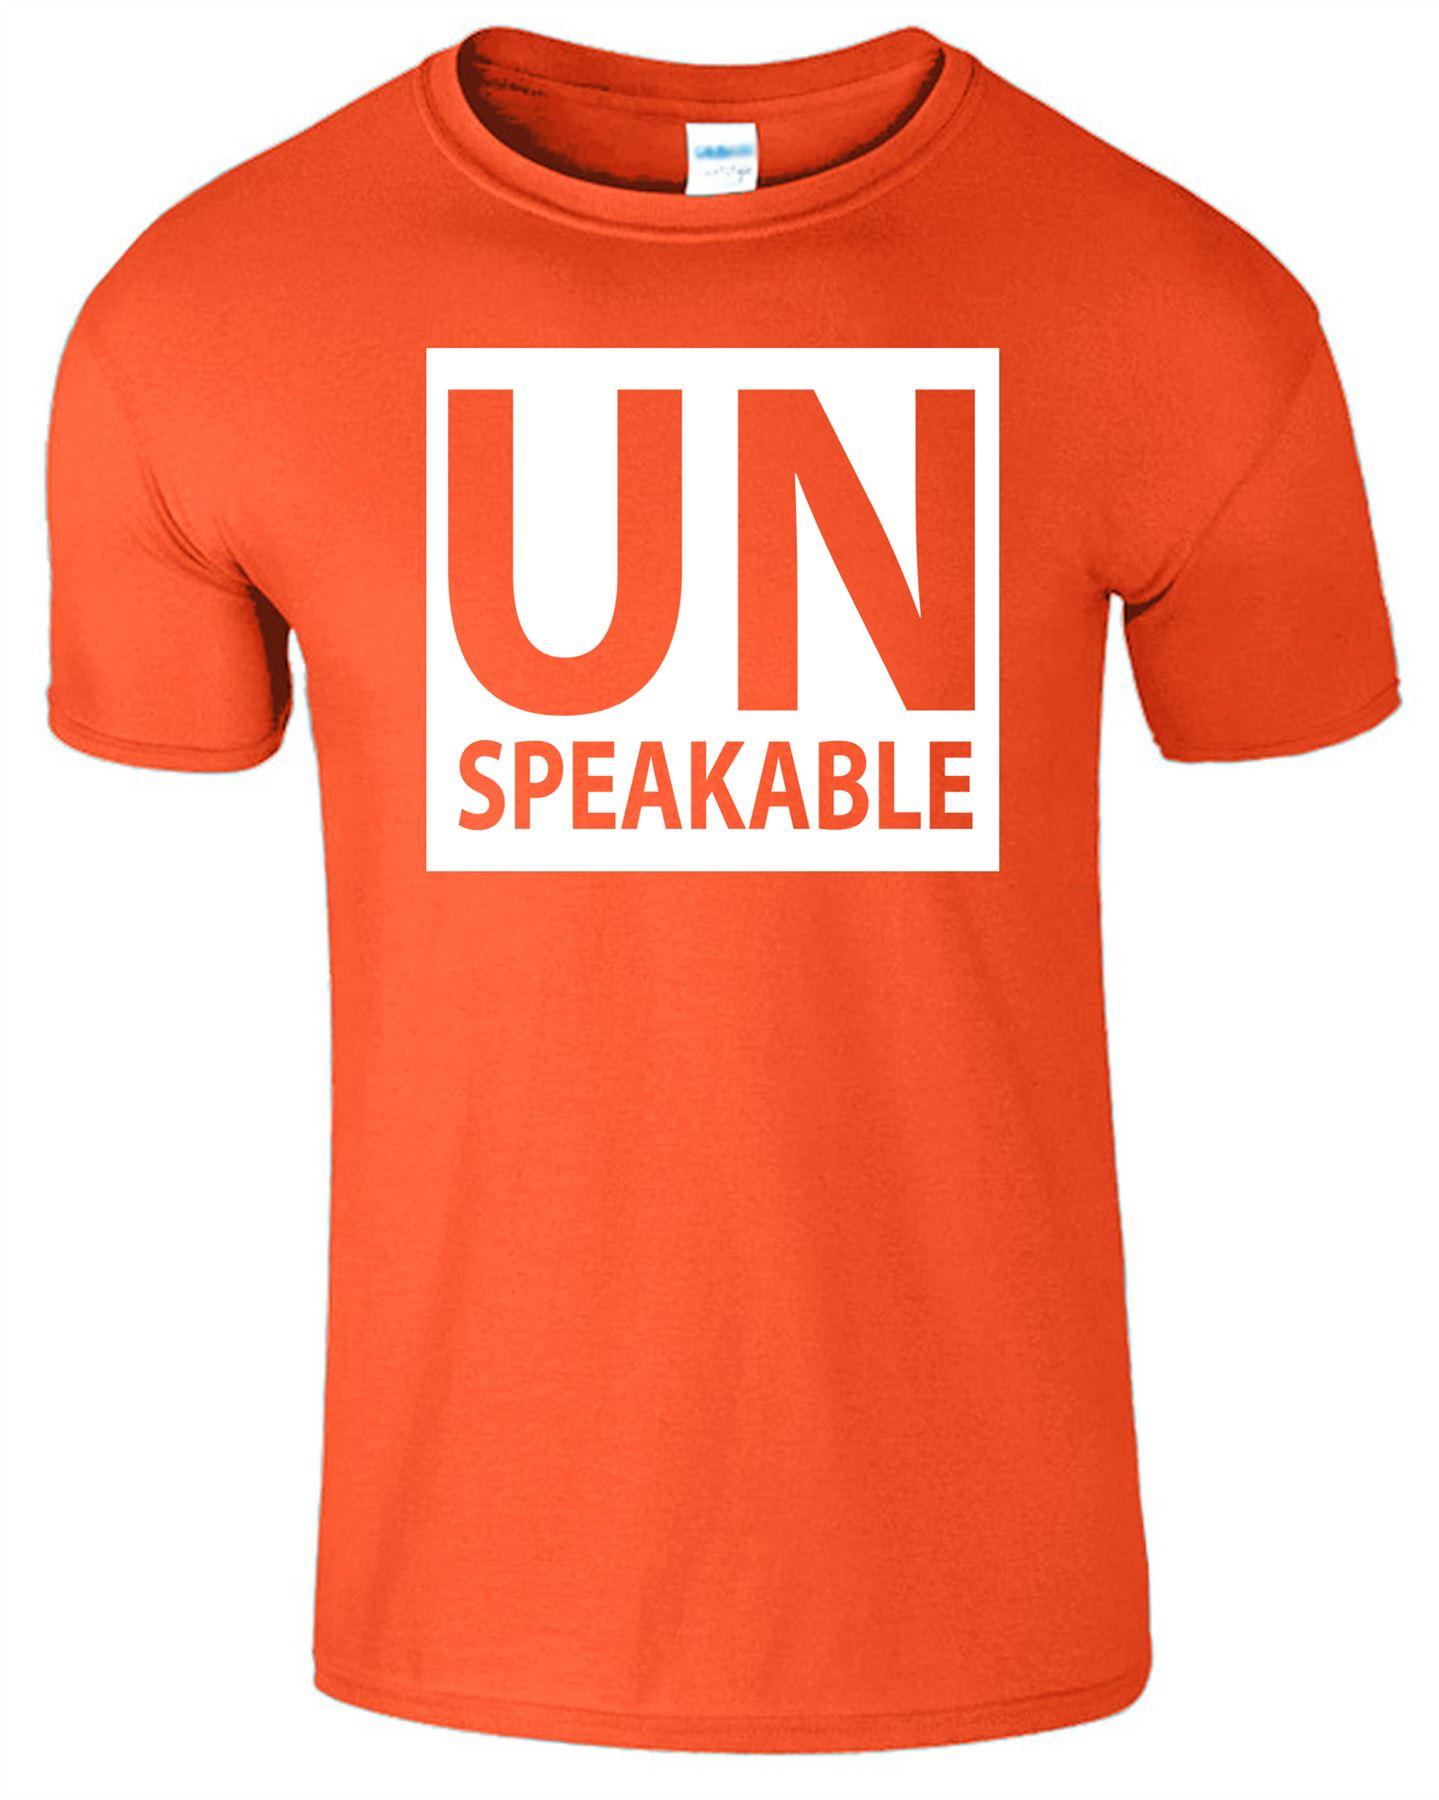 Unspeakable Mens T-Shirt Gaming Youtuber Vlog Short Sleeve Gift Top Tshirt